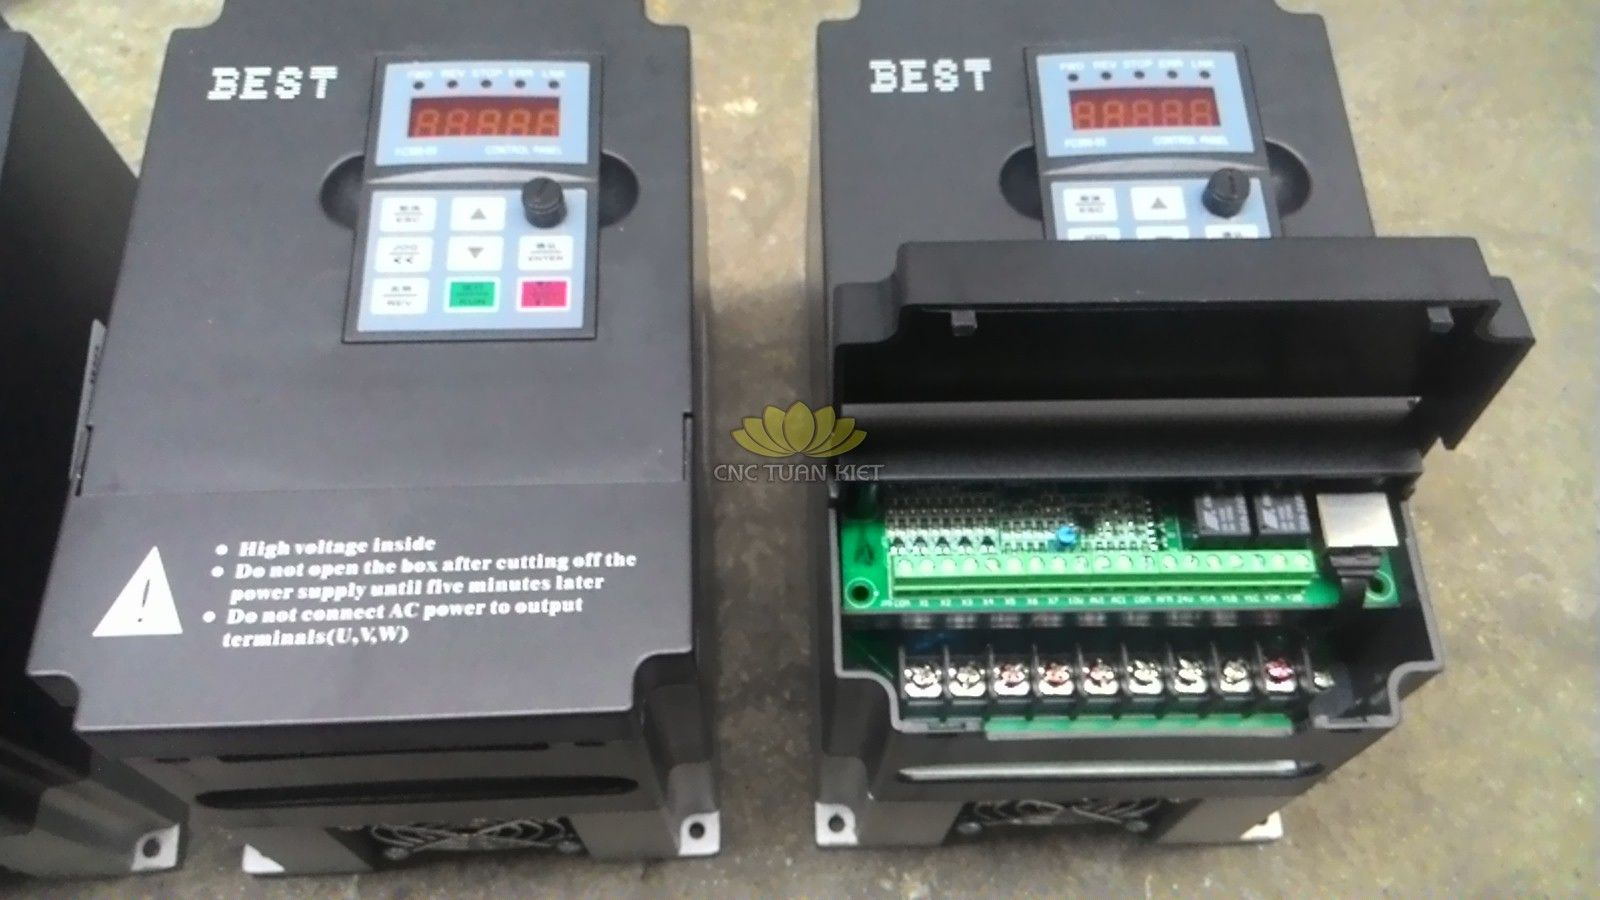 Hng Dn Cch Ci T Bin Tn Cho My Cnc Tun Kit Pi Projects Buy Alamode Controller Calculator Raspberry